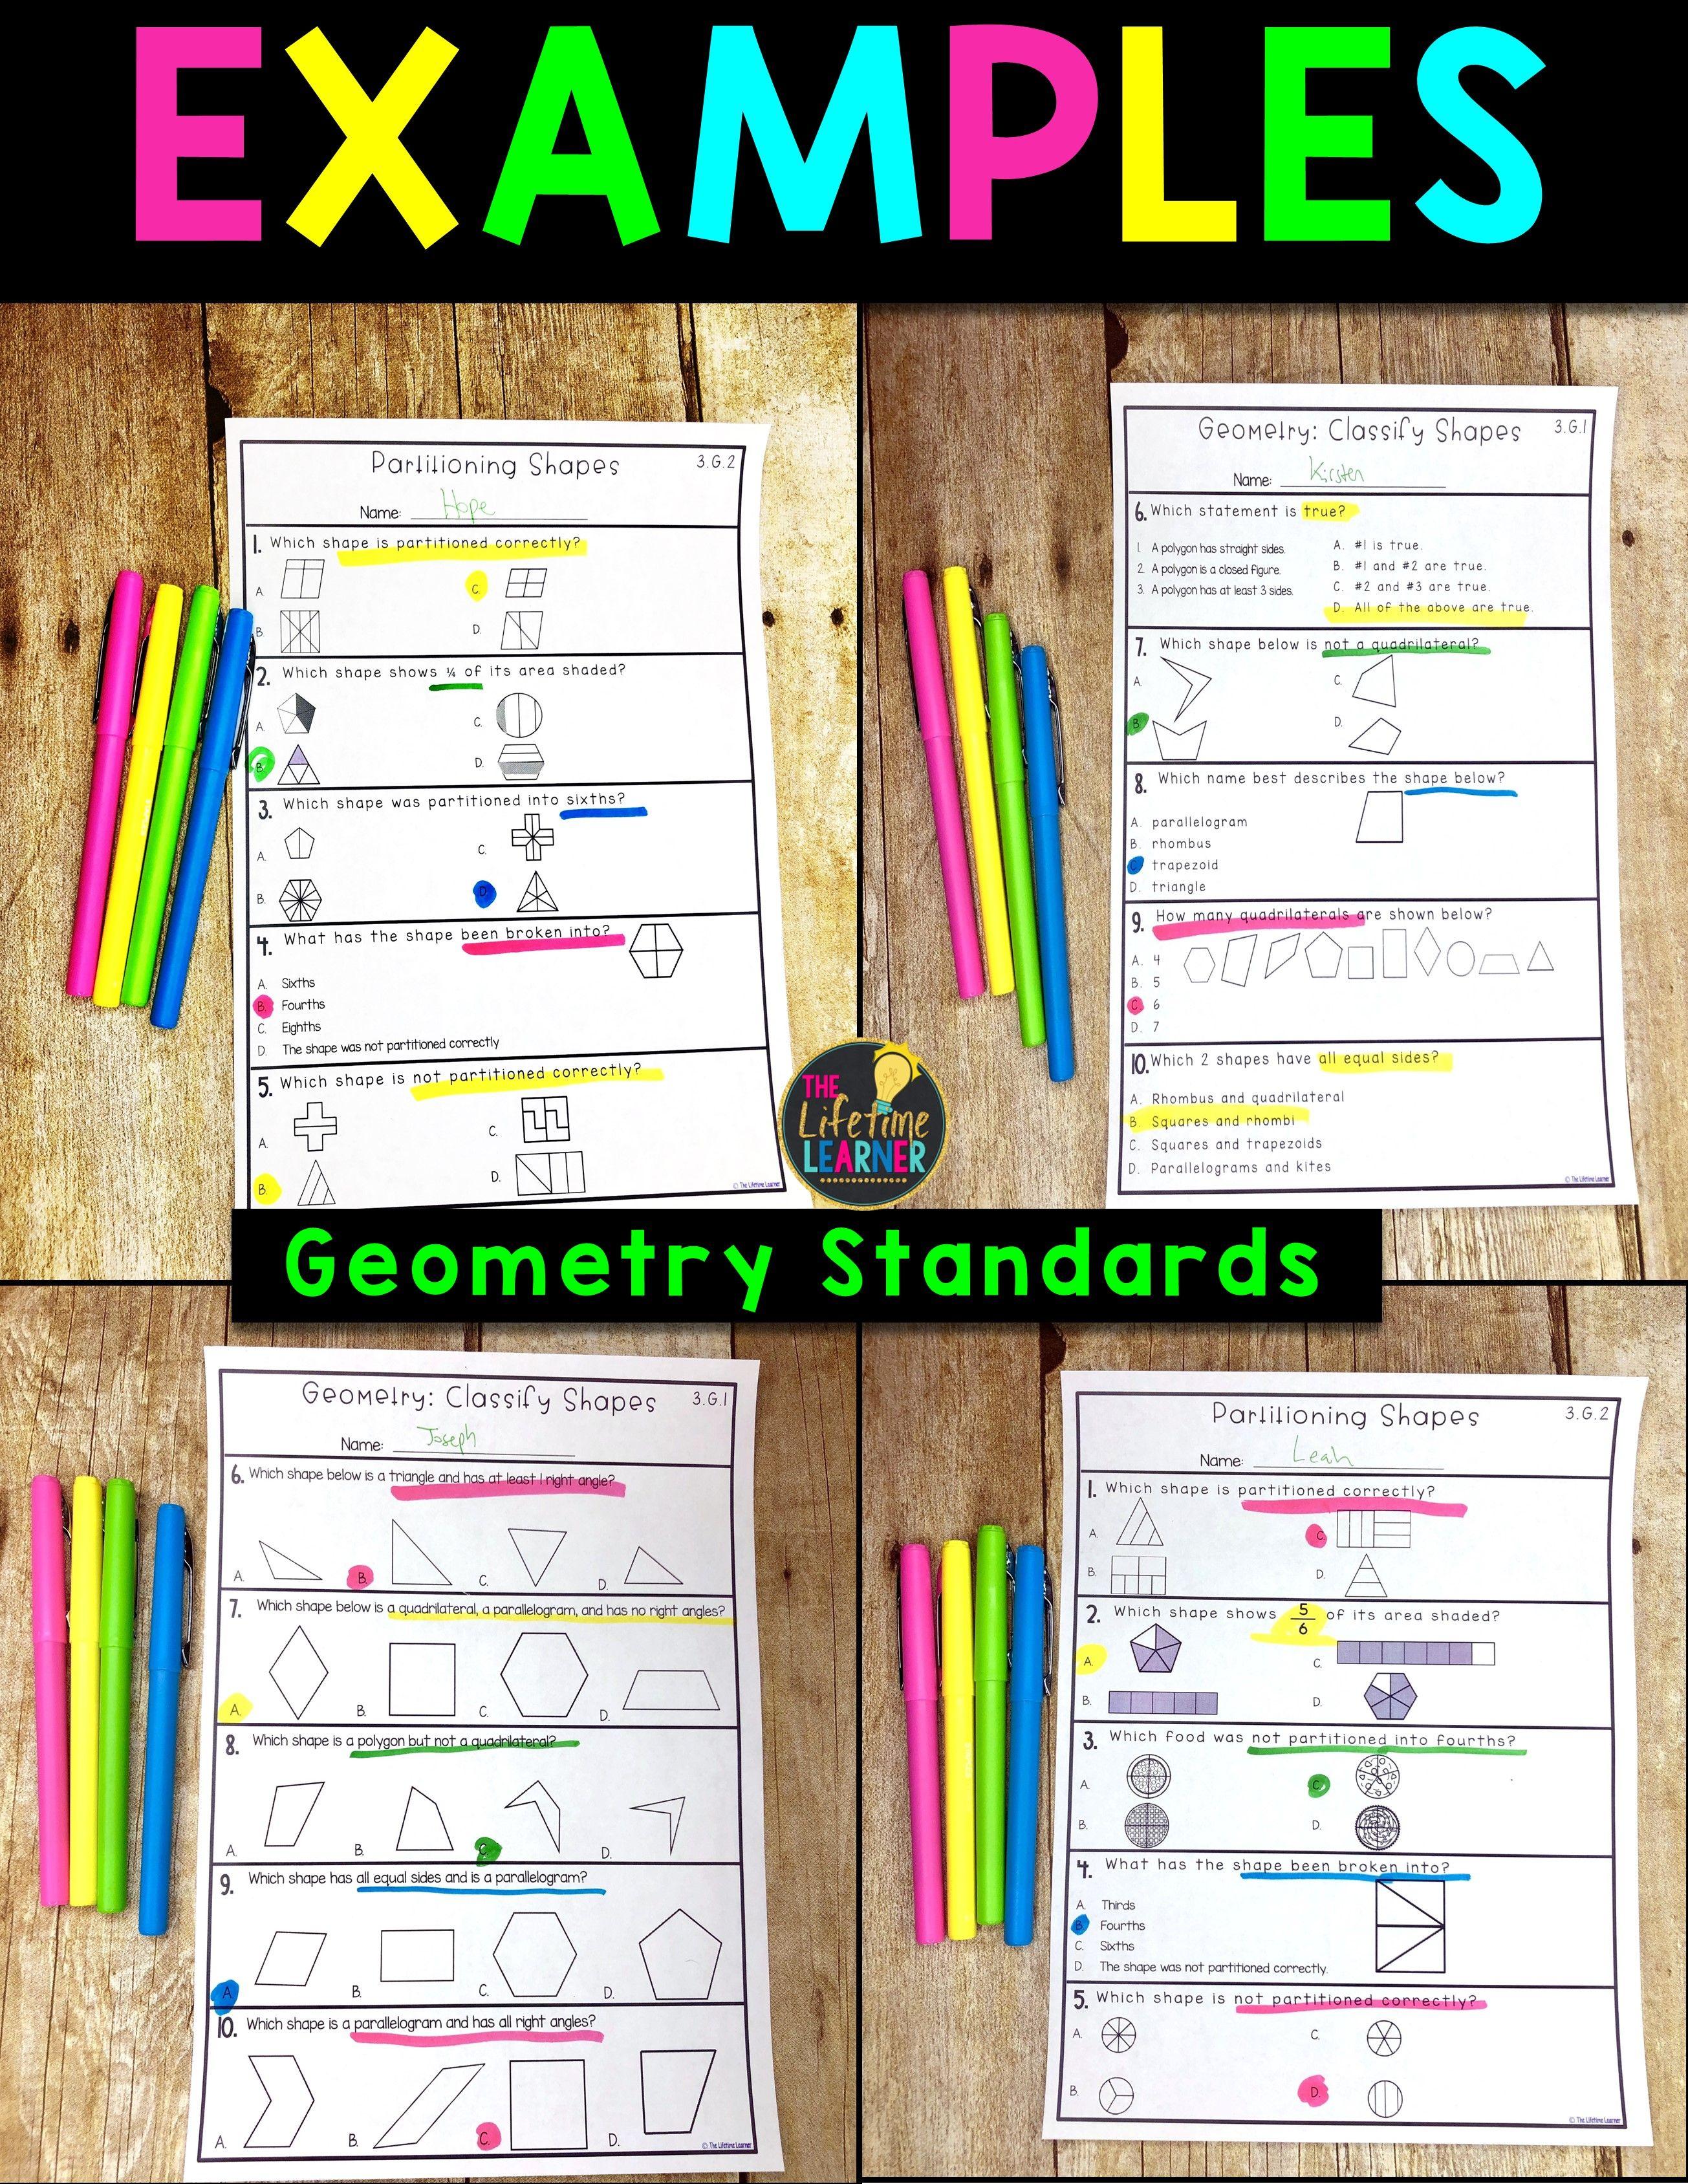 3rd Grade Geometry Worksheets 3rd Grade Math Worksheets Geometry Worksheets 3rd Grade Math